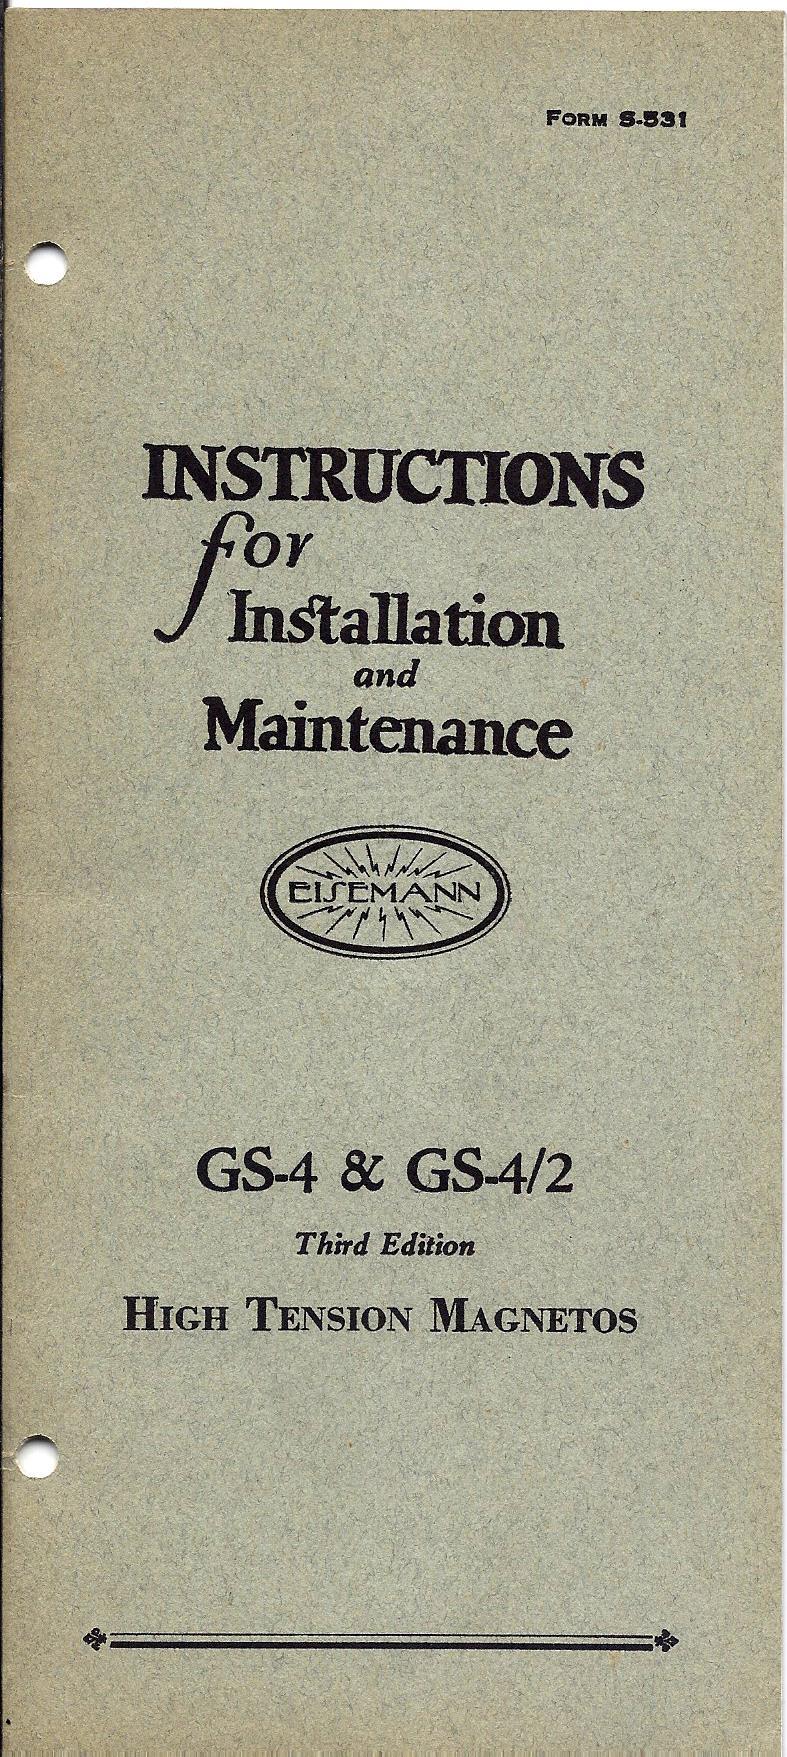 gs4-gs4-2-instr-pa.jpg